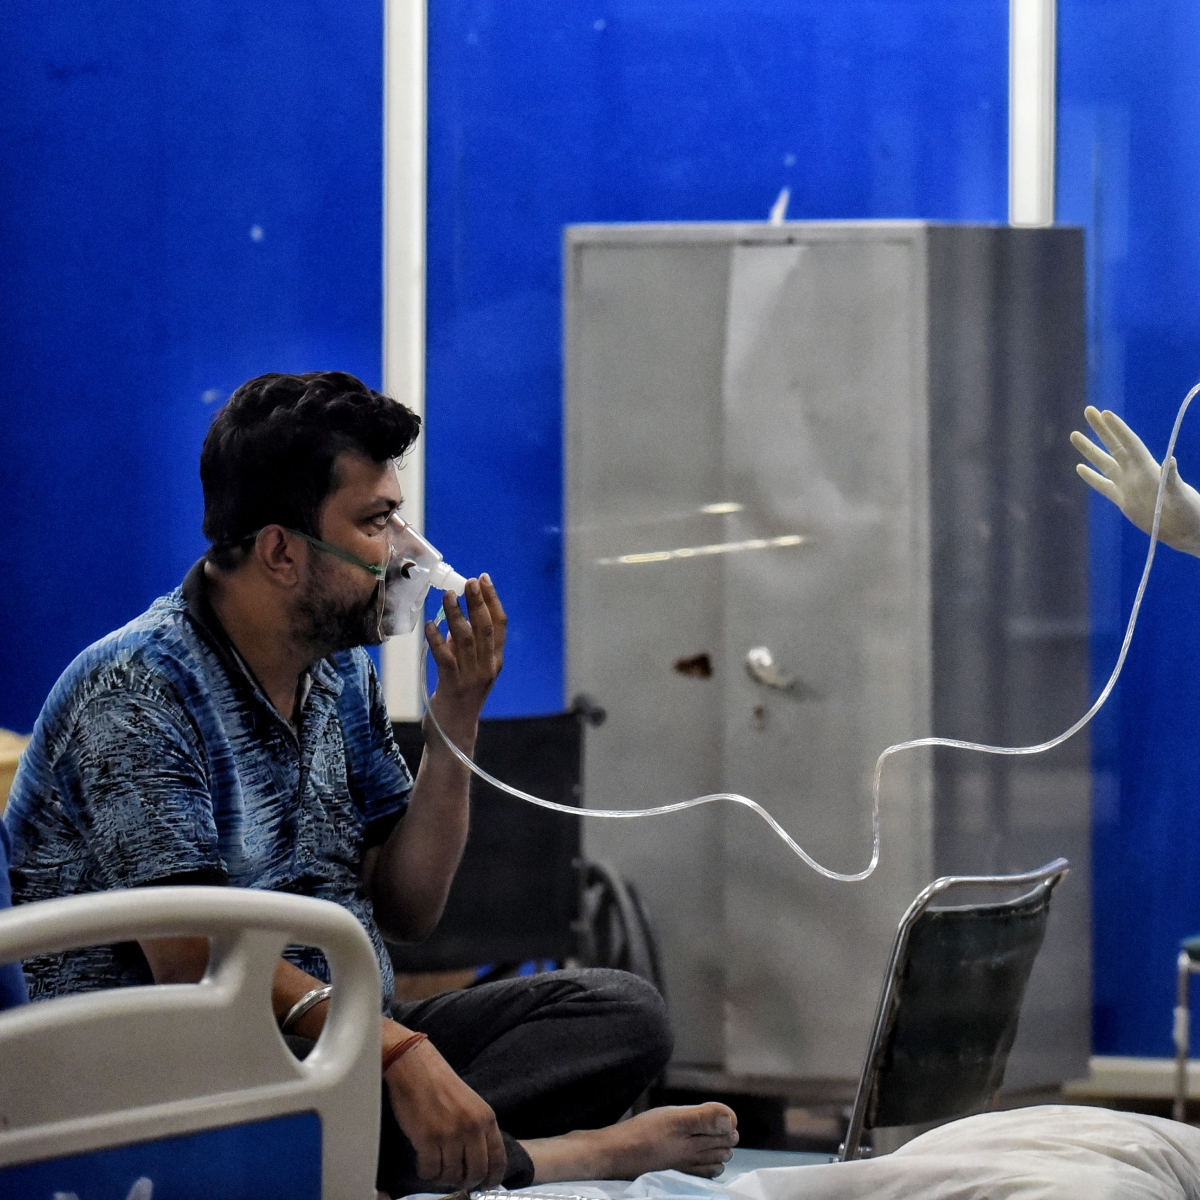 Japan to provide 300 oxygen generators, 300 ventilators to India amid COVID-19 surge